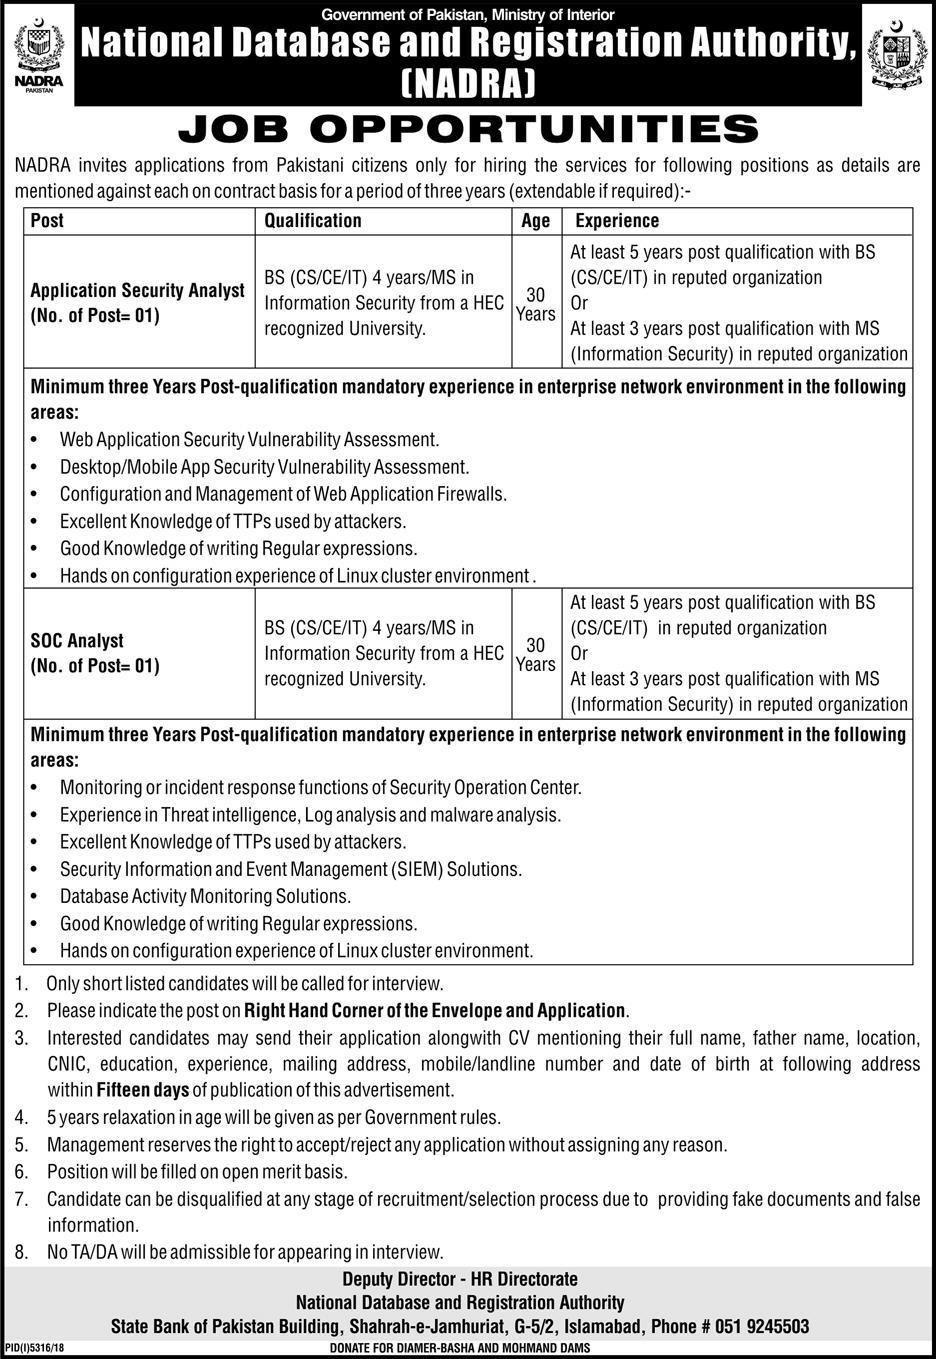 National Database & Registration Authority NADRA Jobs 2019